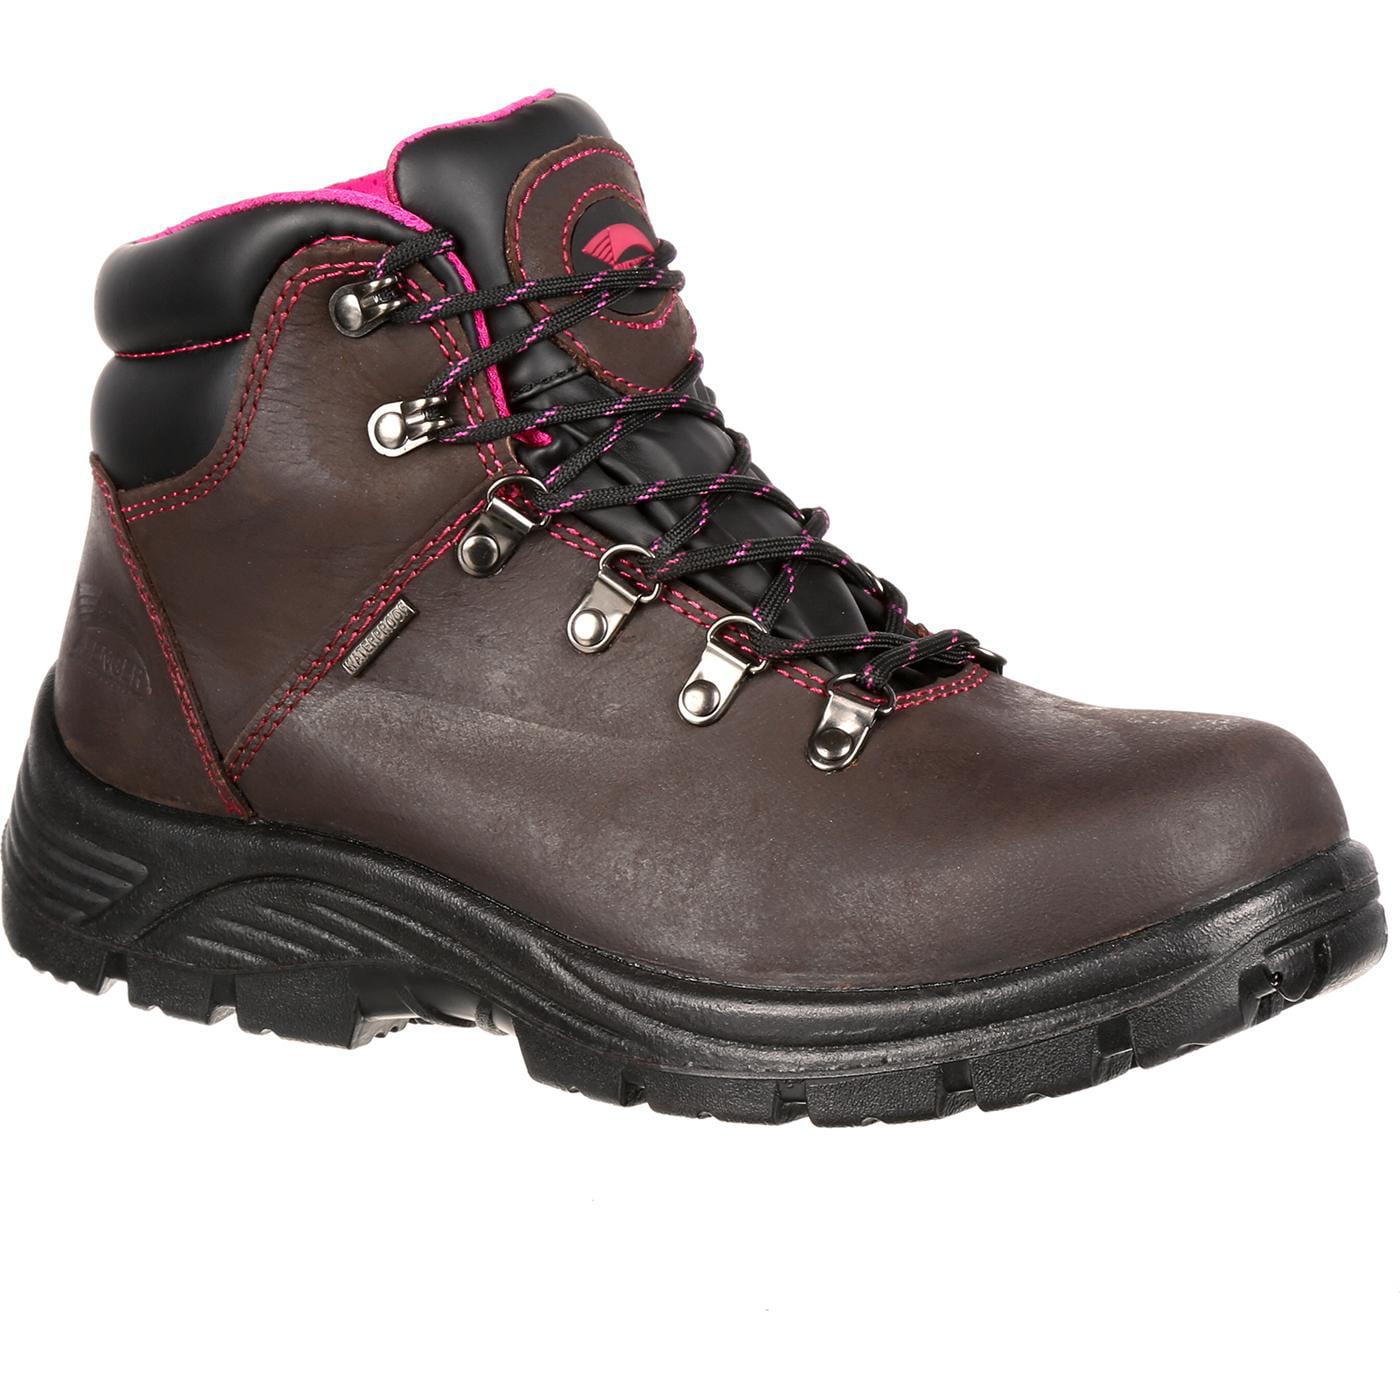 Avenger Women's A7125 Steel Safety Toe Work Boot